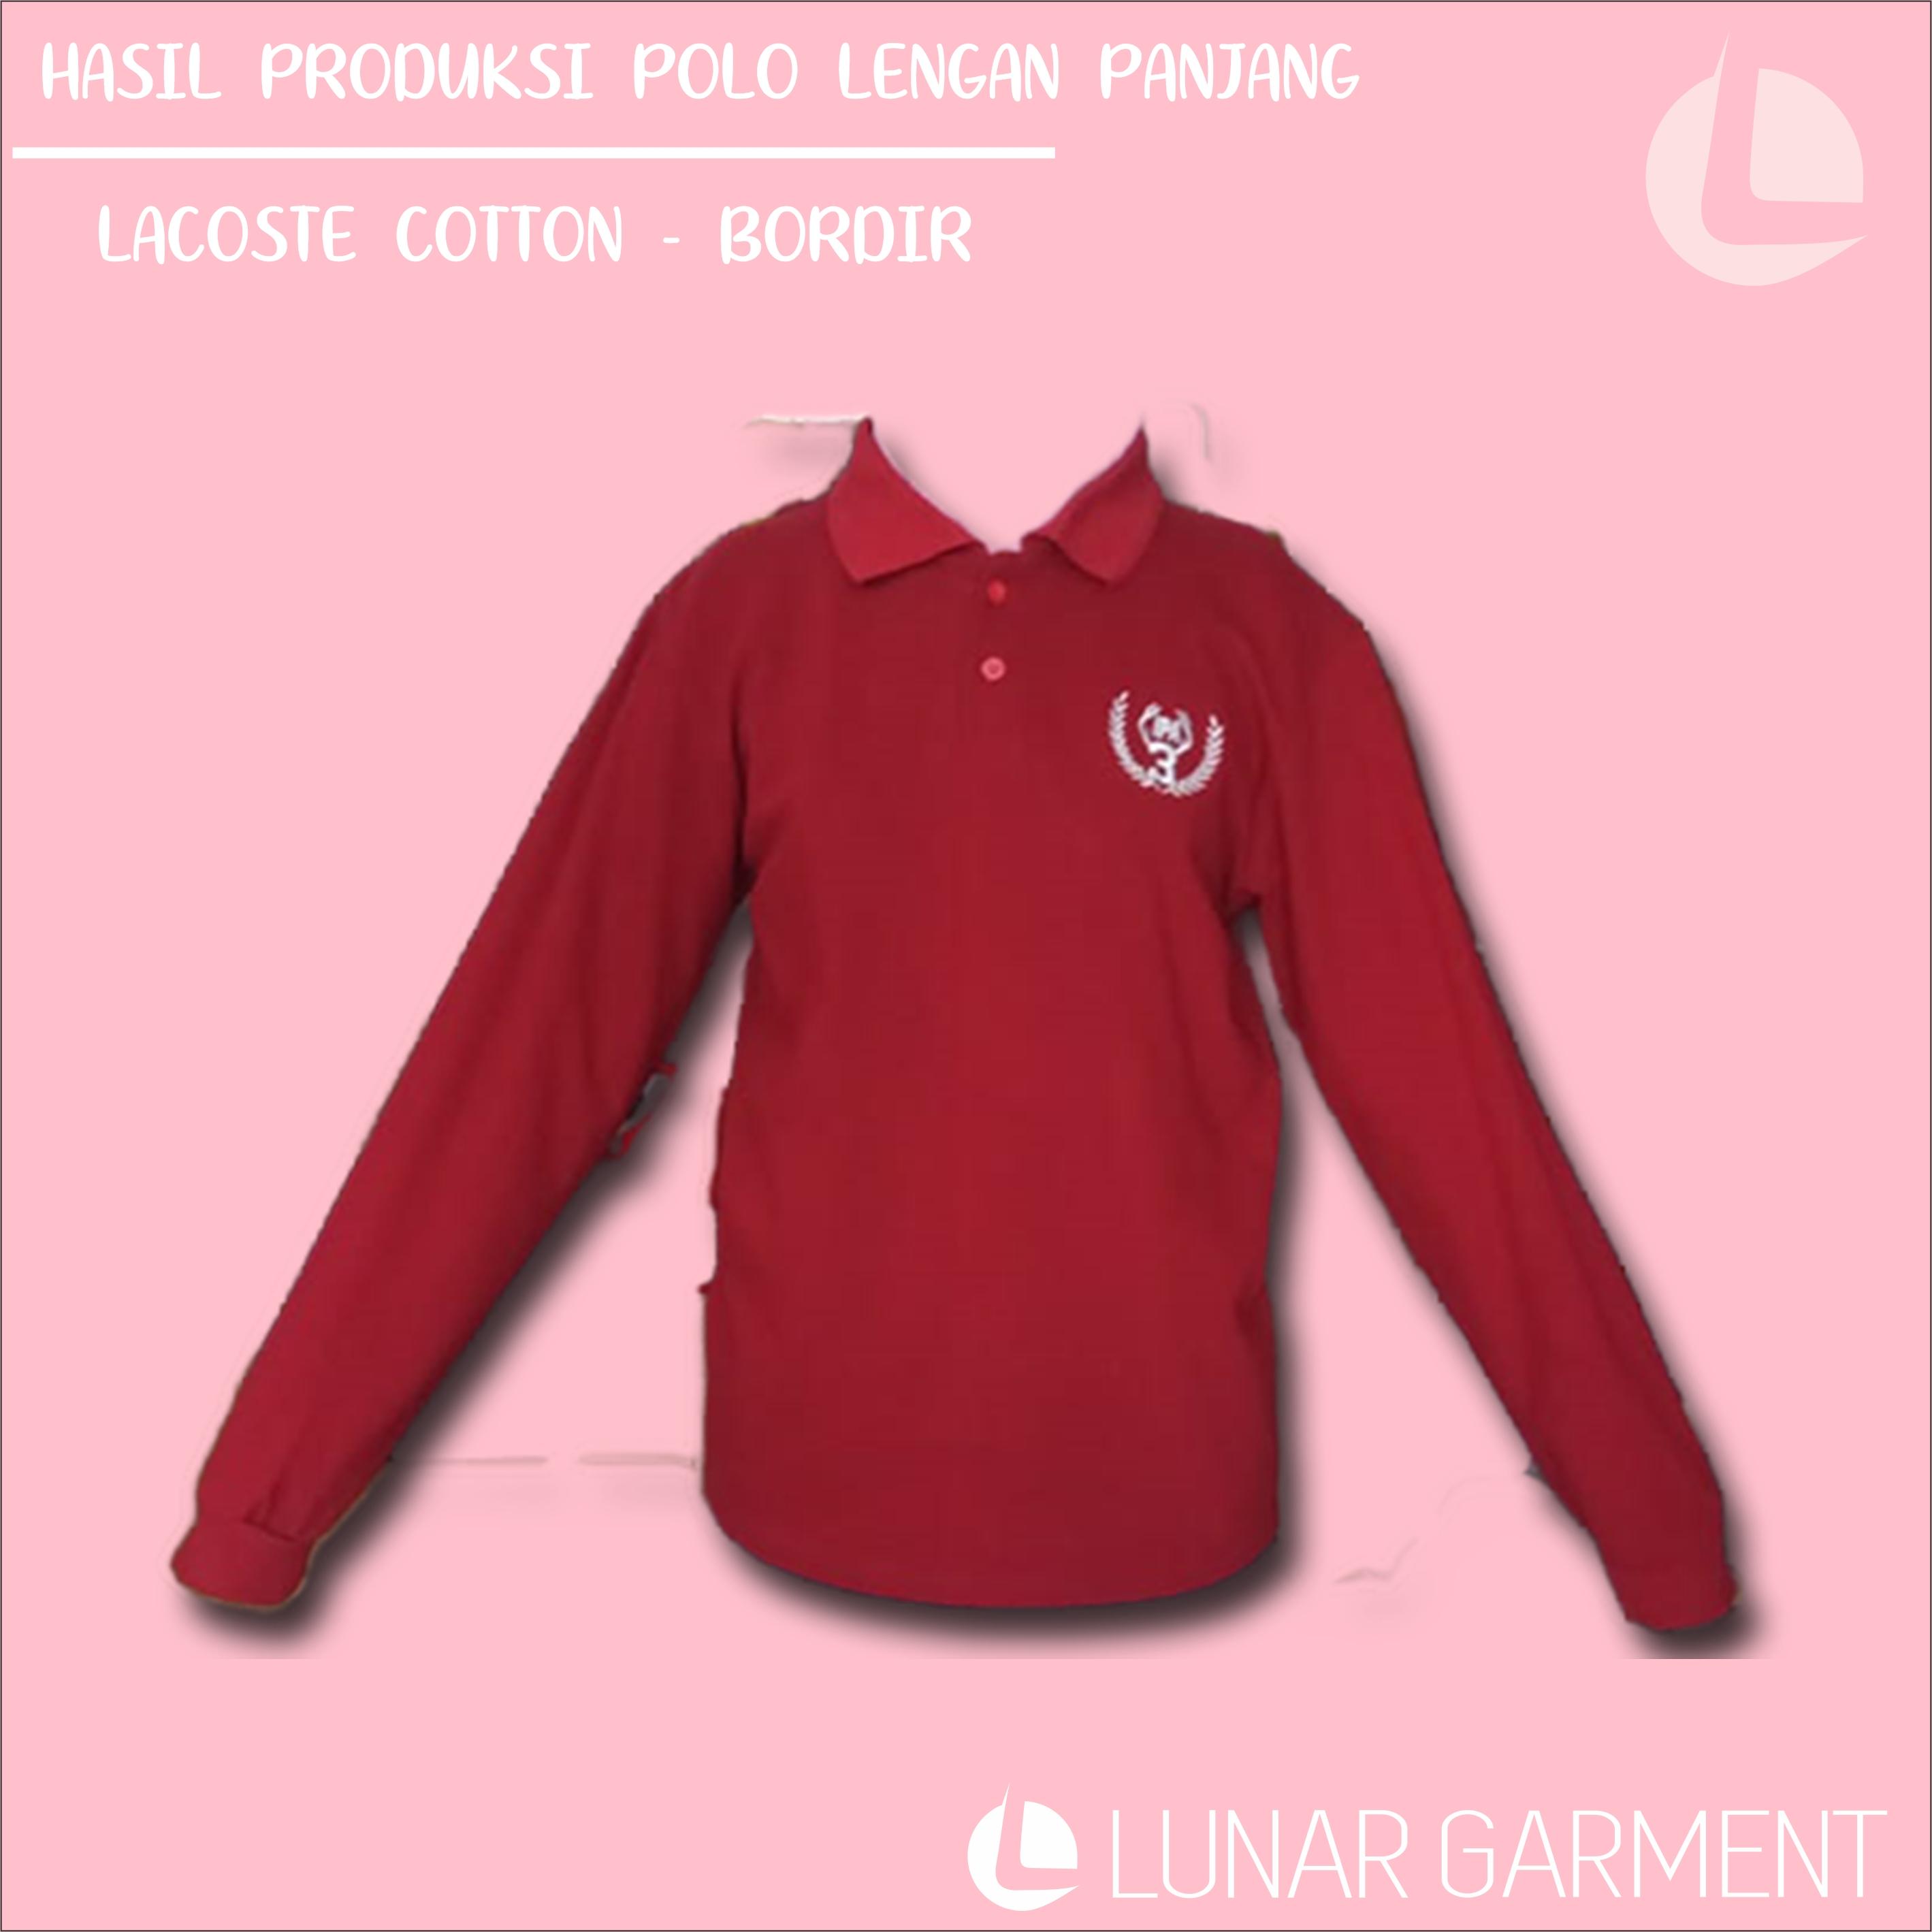 Hasil Produksi Polo Lengan Panjang – Lacoste Cotton & Bordir